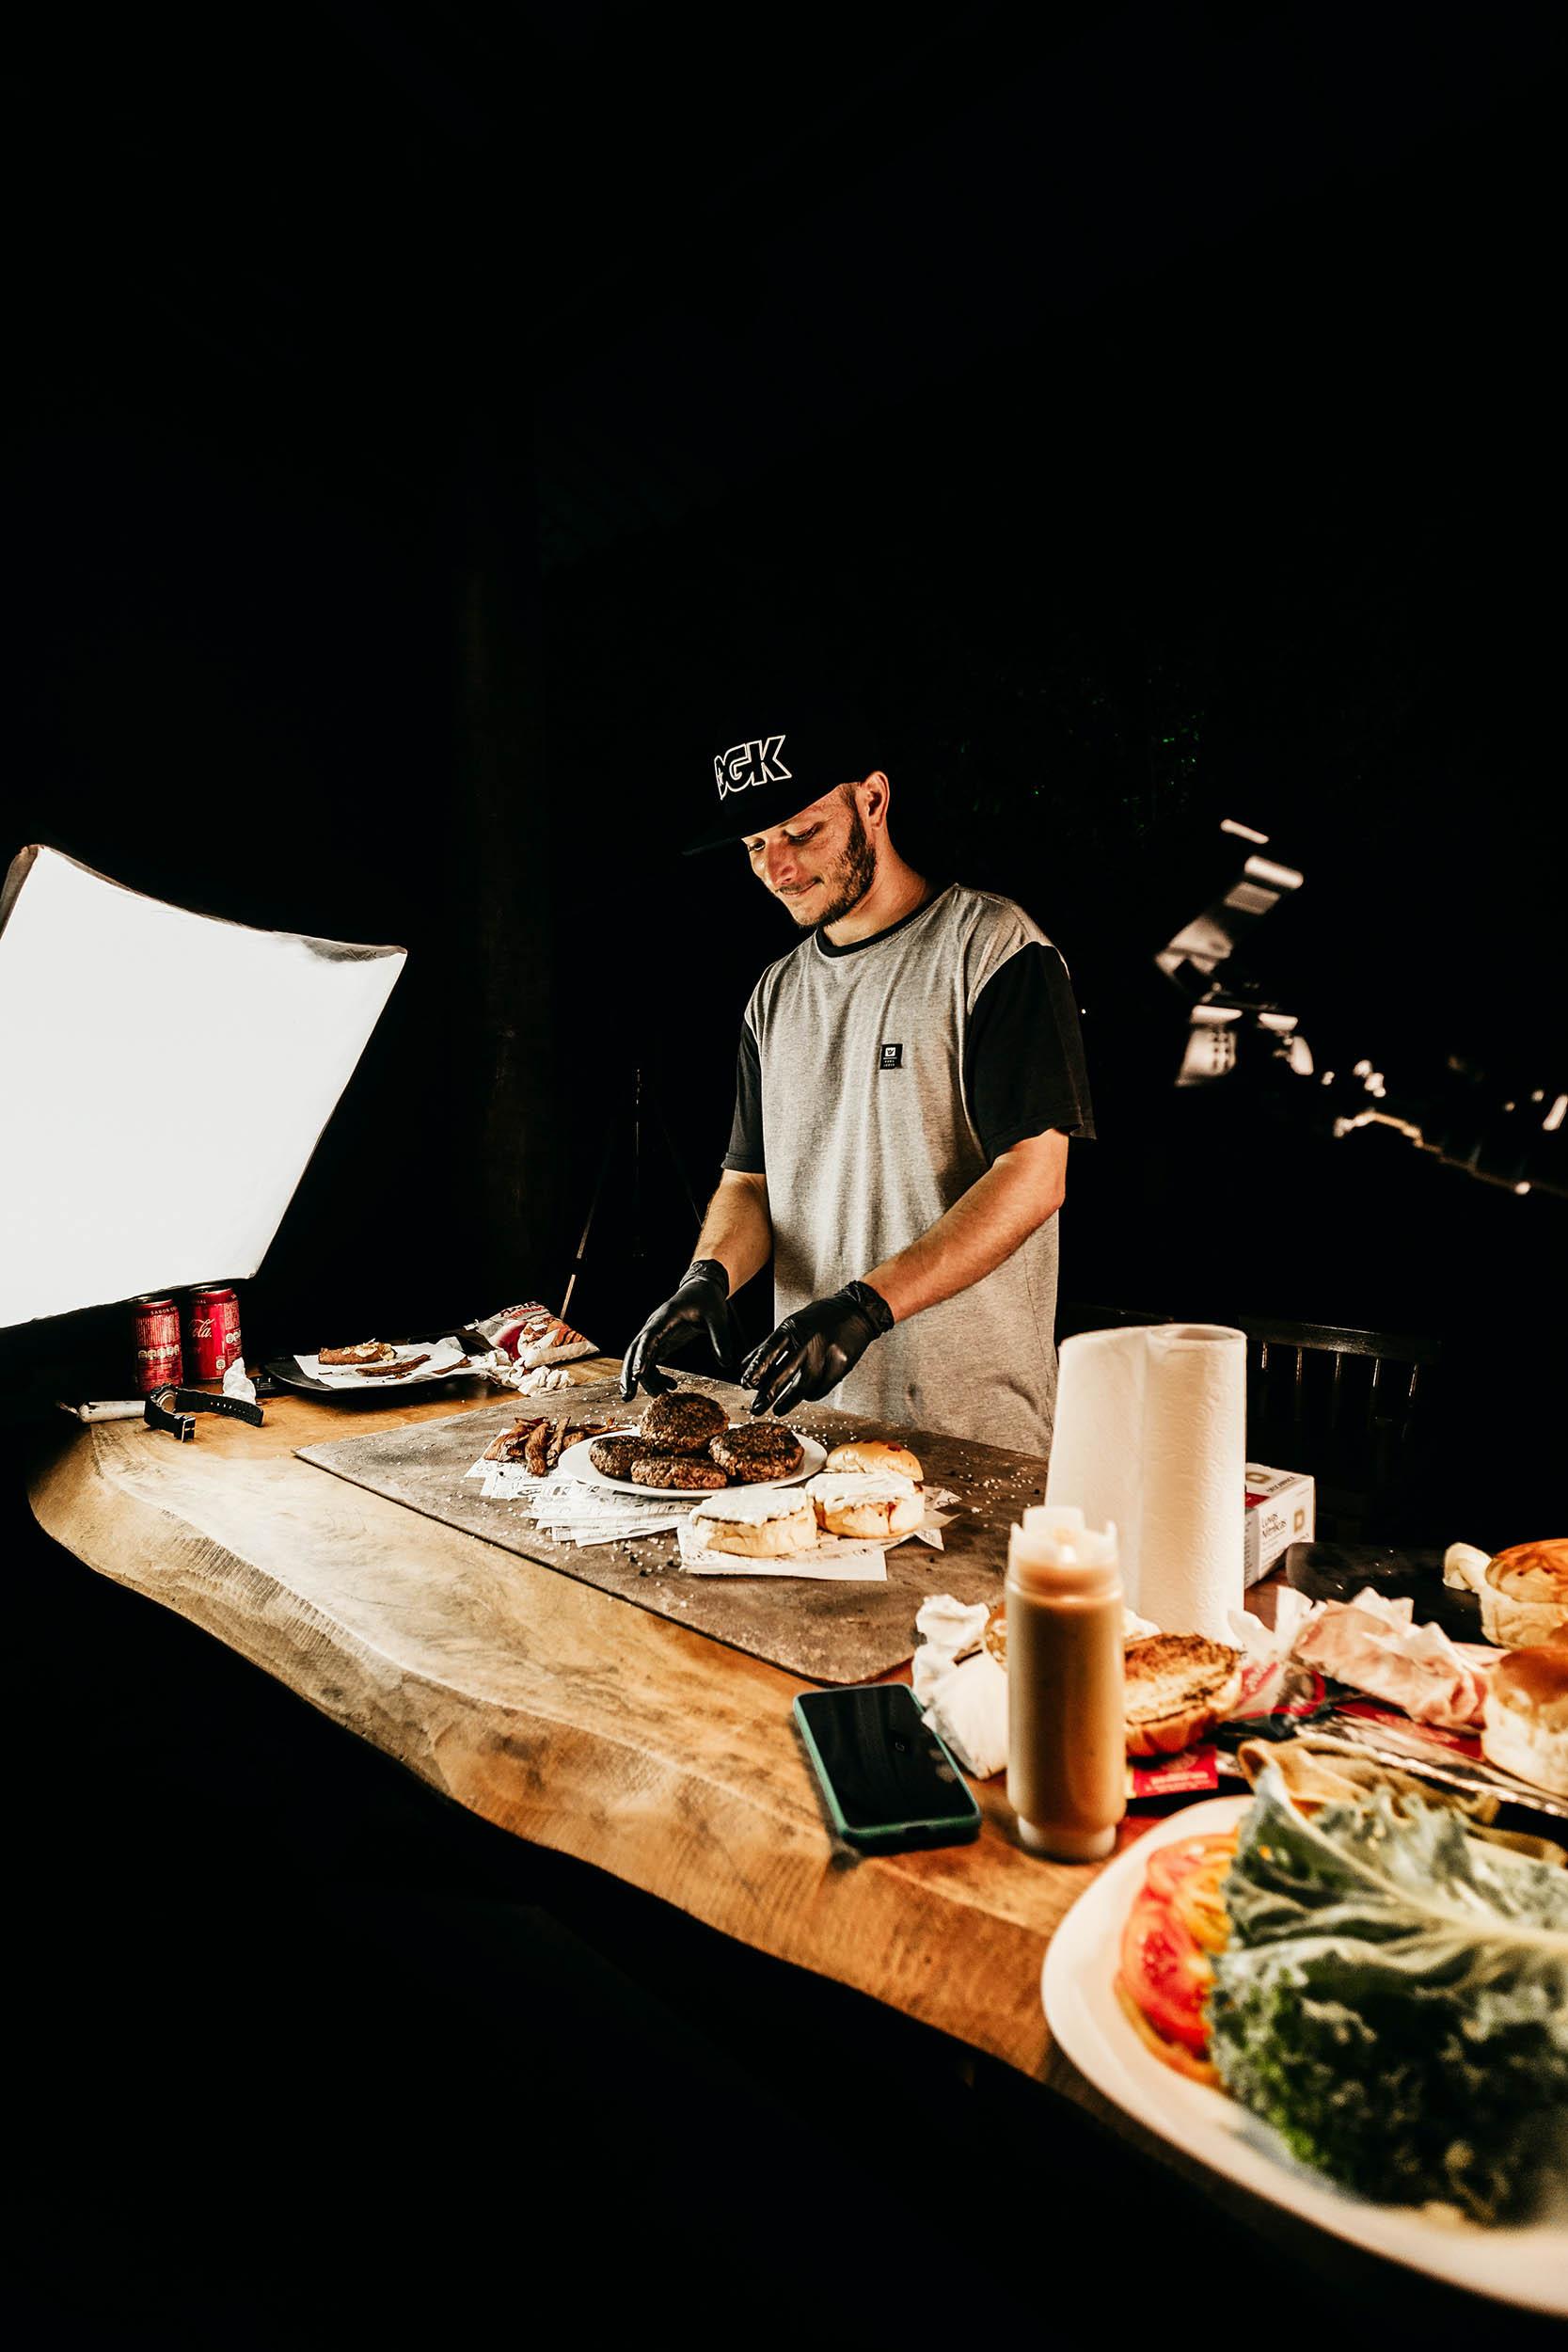 food styling ps blog 03 Food Photography Restaurant Photography Basics